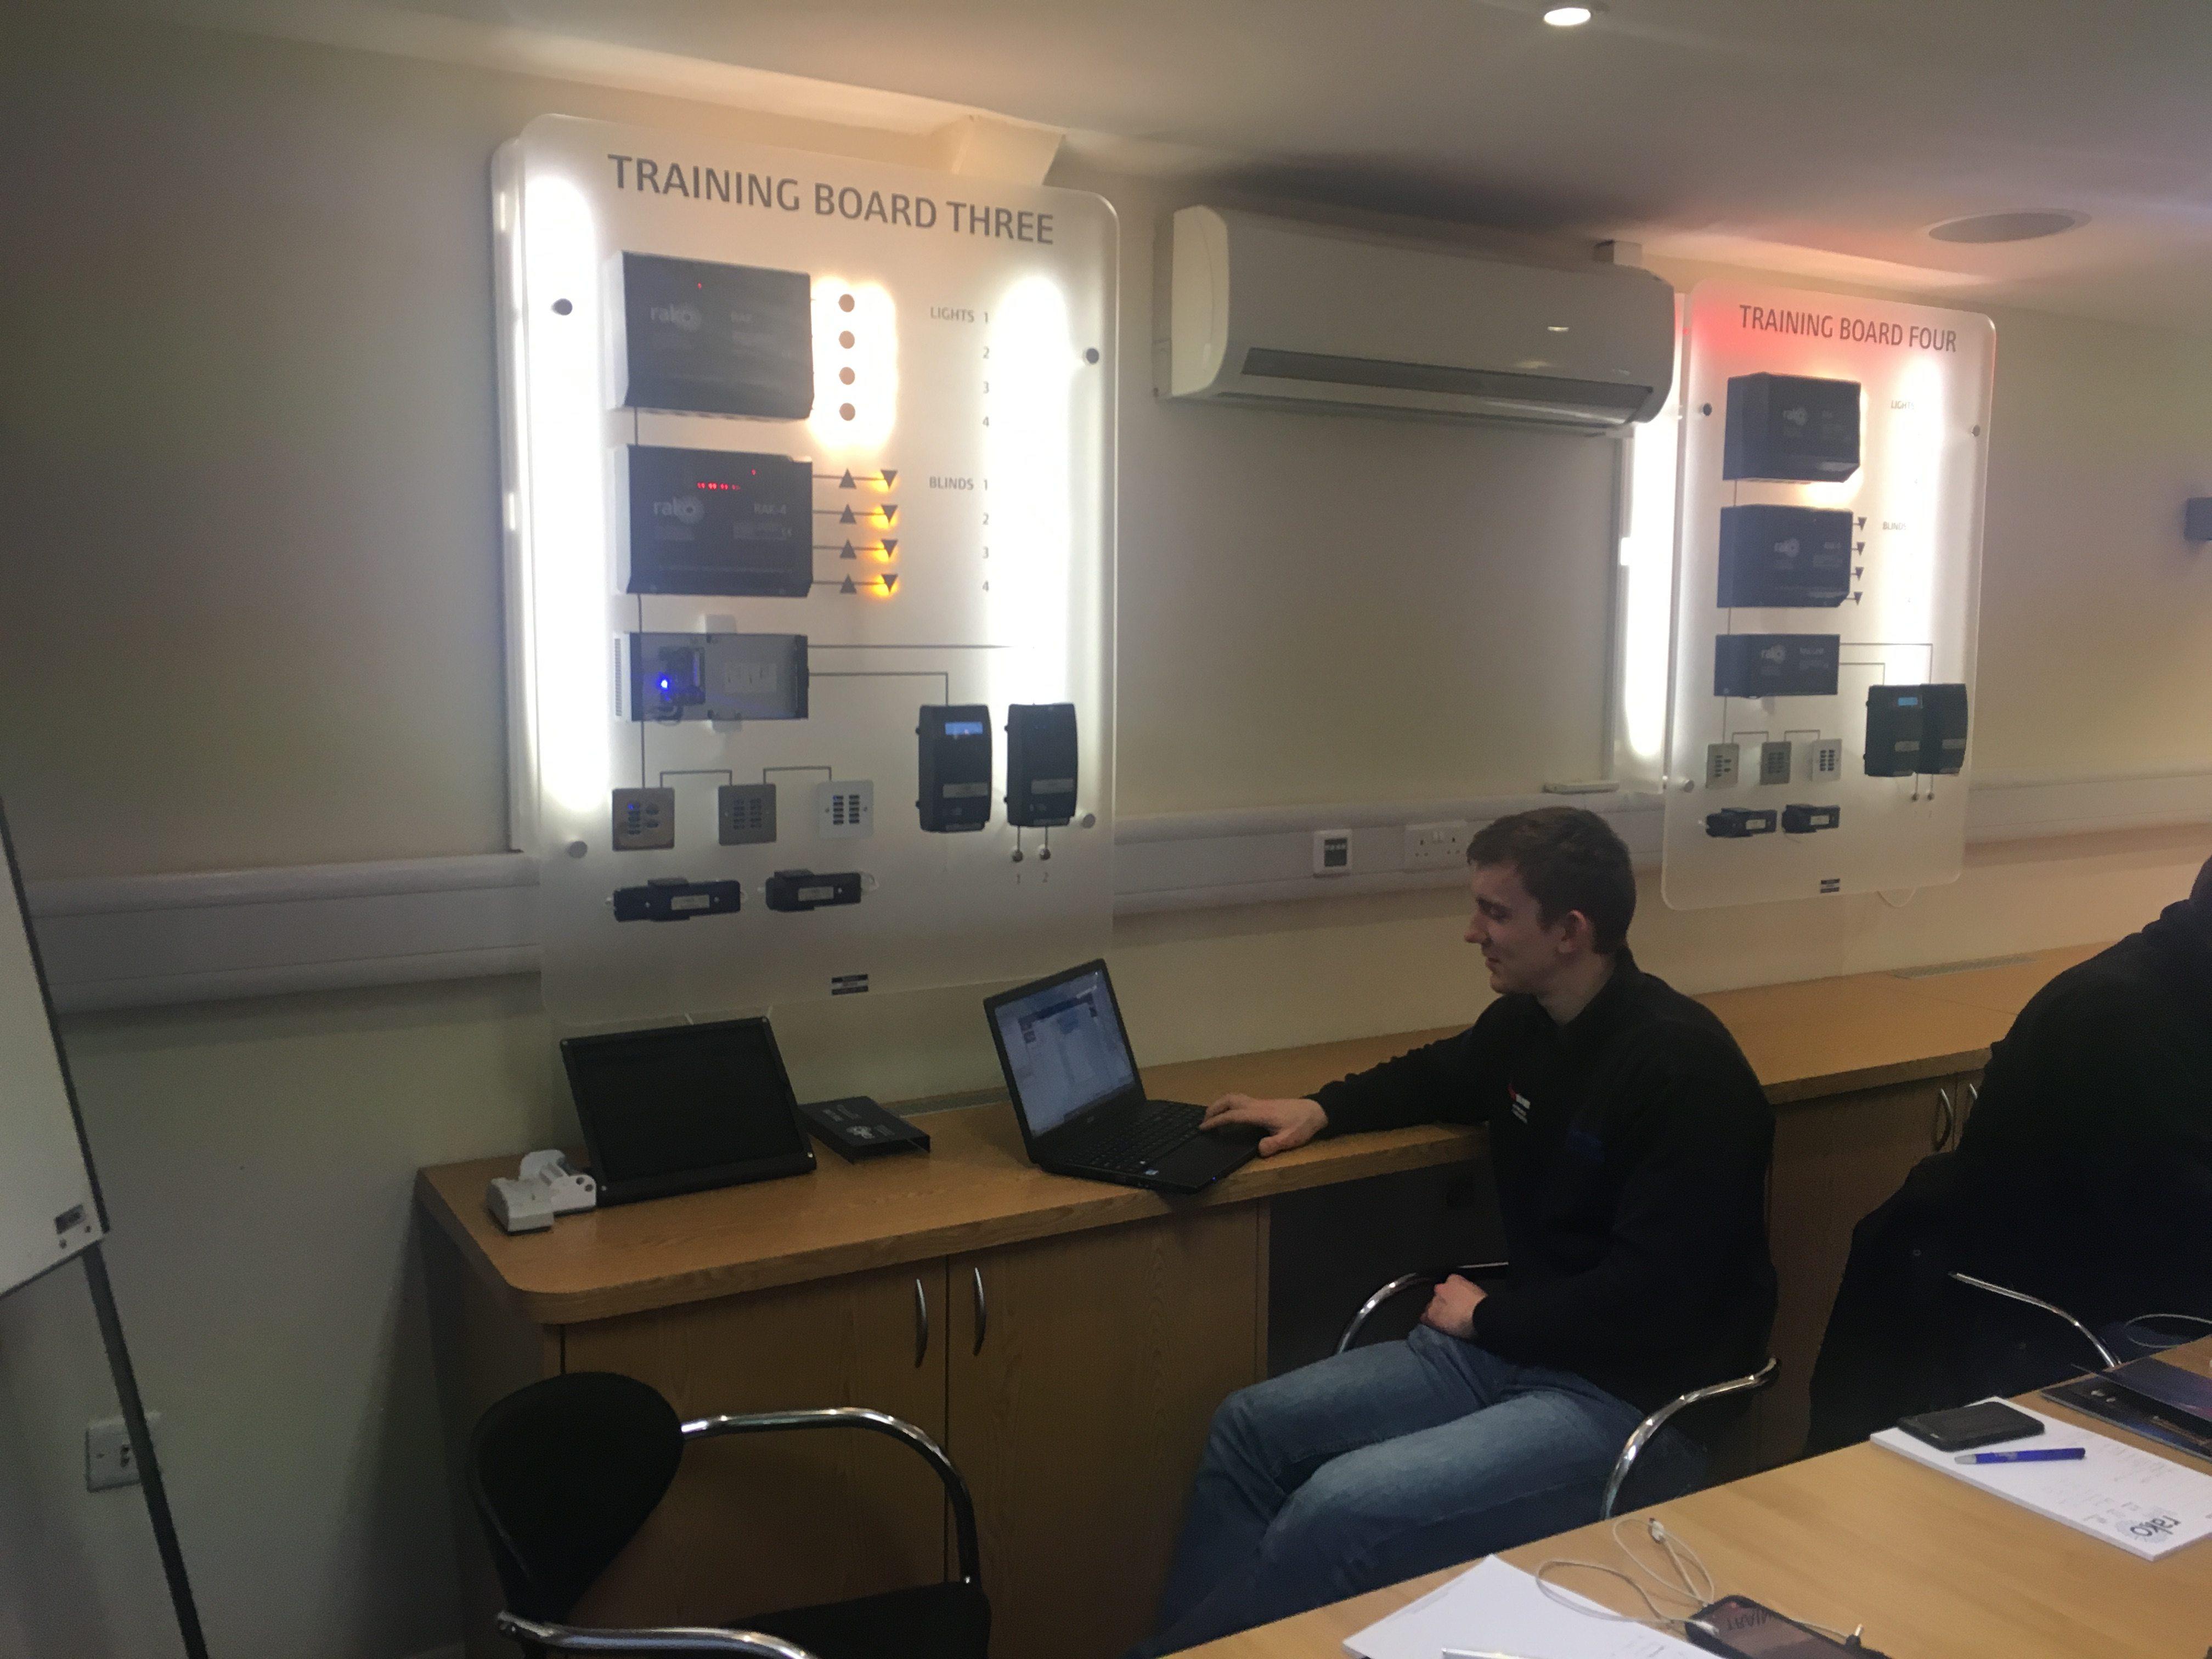 Jake at the training board